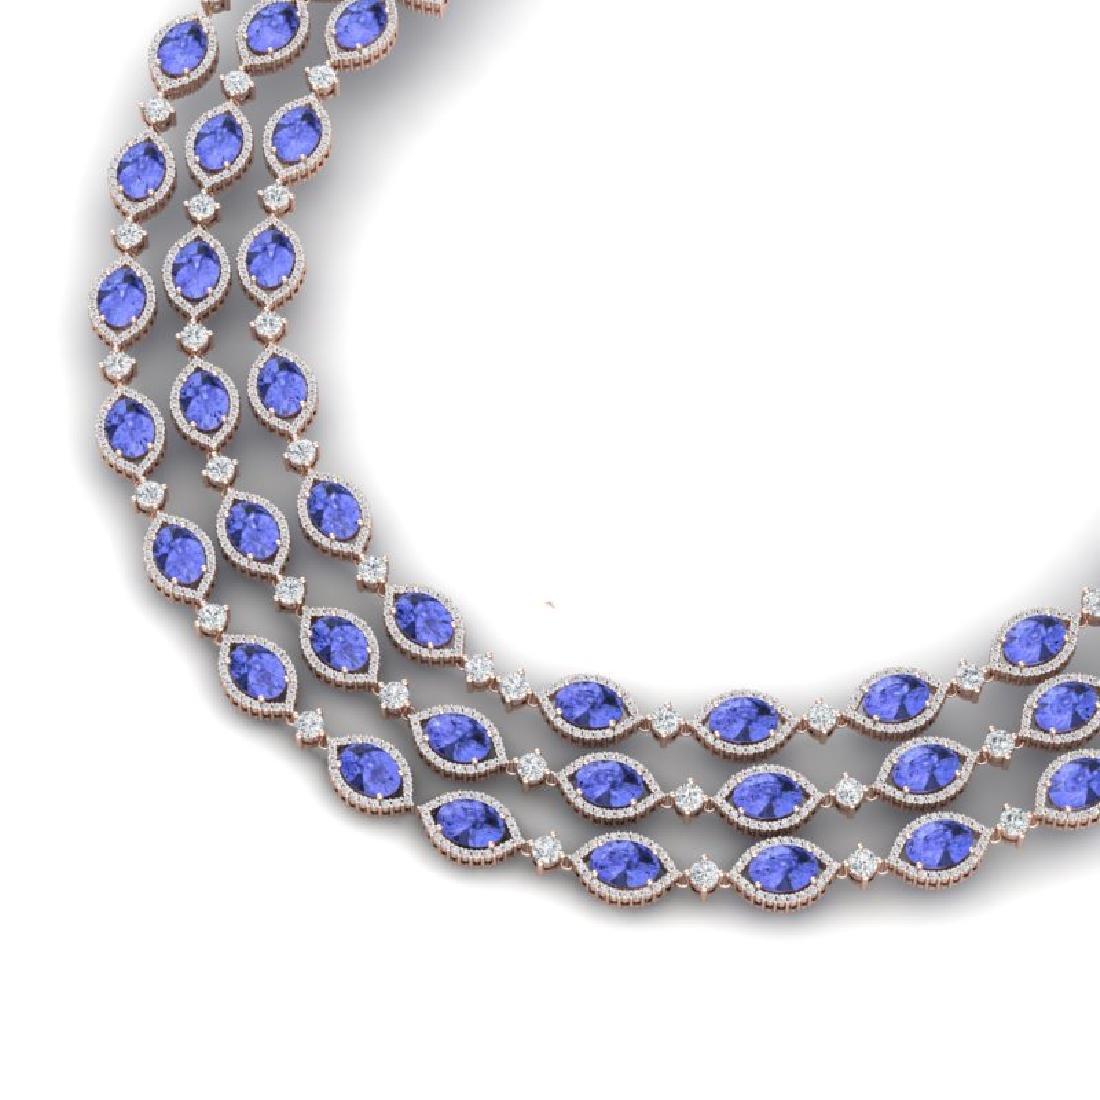 79.33 CTW Royalty Tanzanite & VS Diamond Necklace 18K